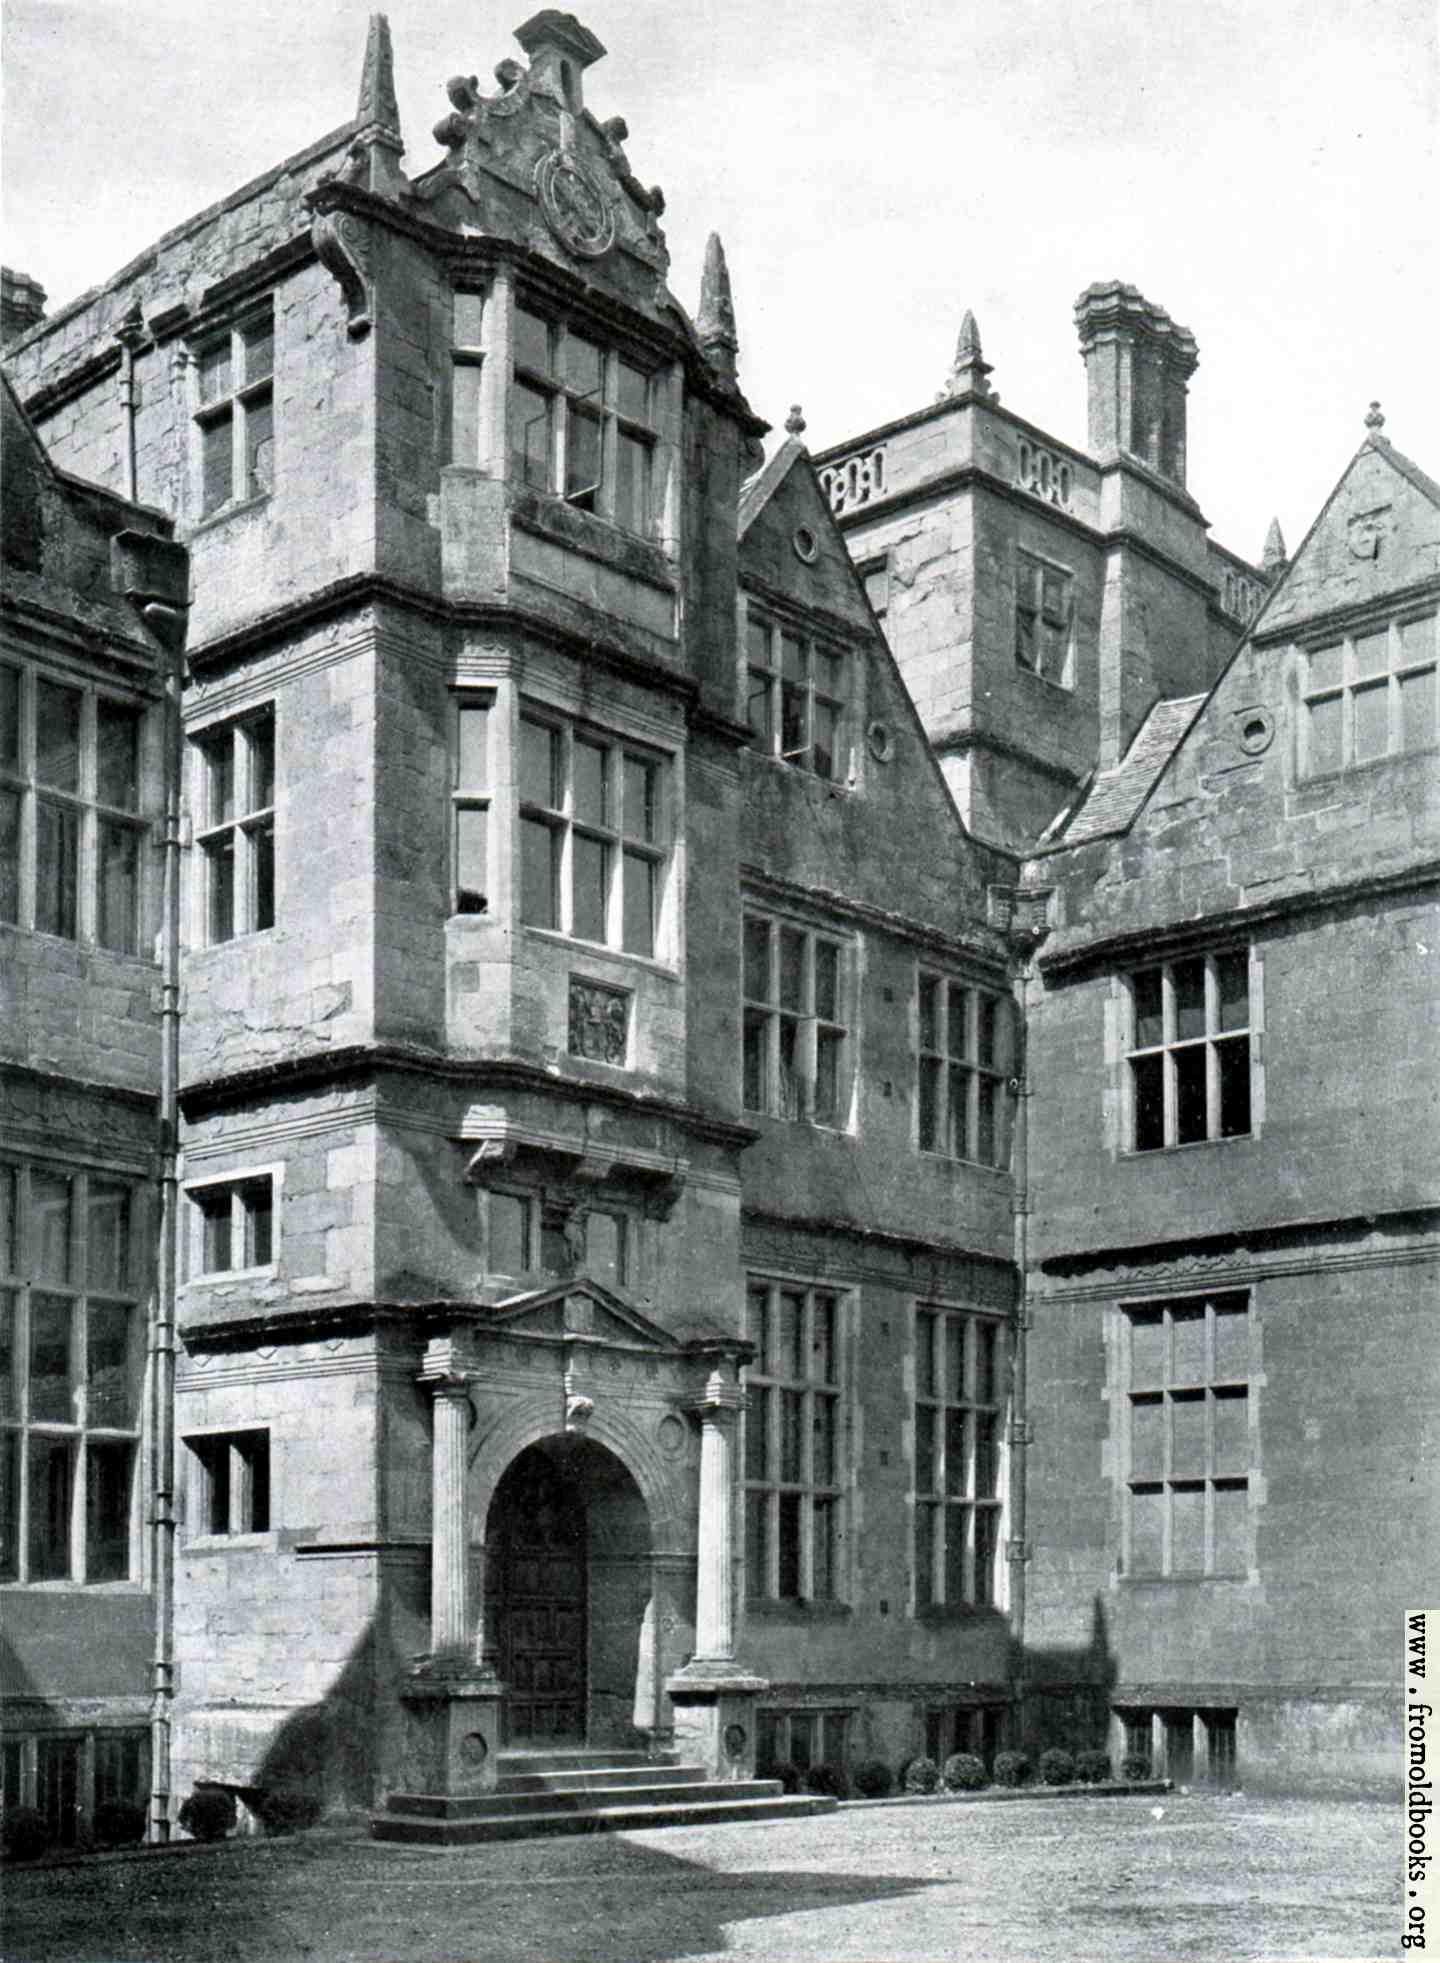 169 Condover Hall Shropshire